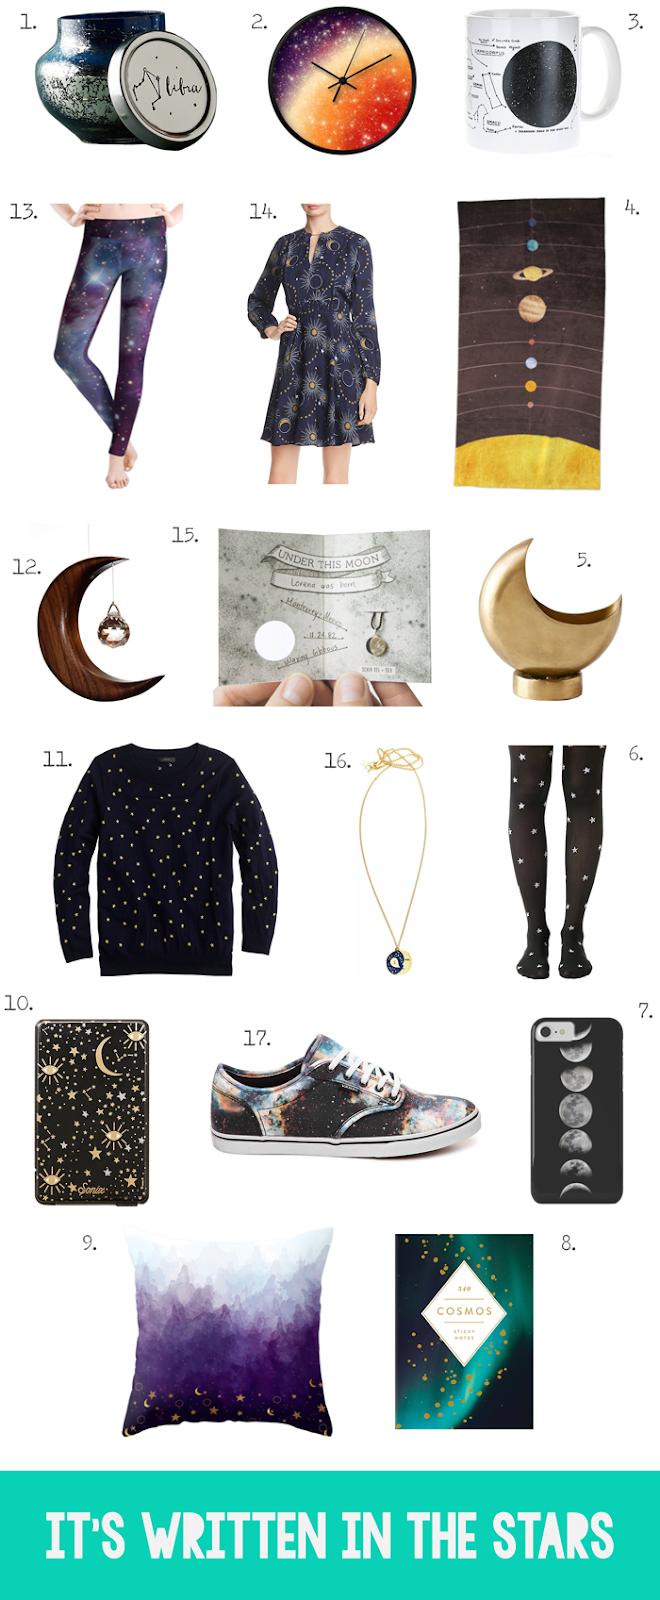 Interstellar, space, moon, sun, constellations, stars, nebulas, fashion trend, accessories, shoes, clothing, home decor